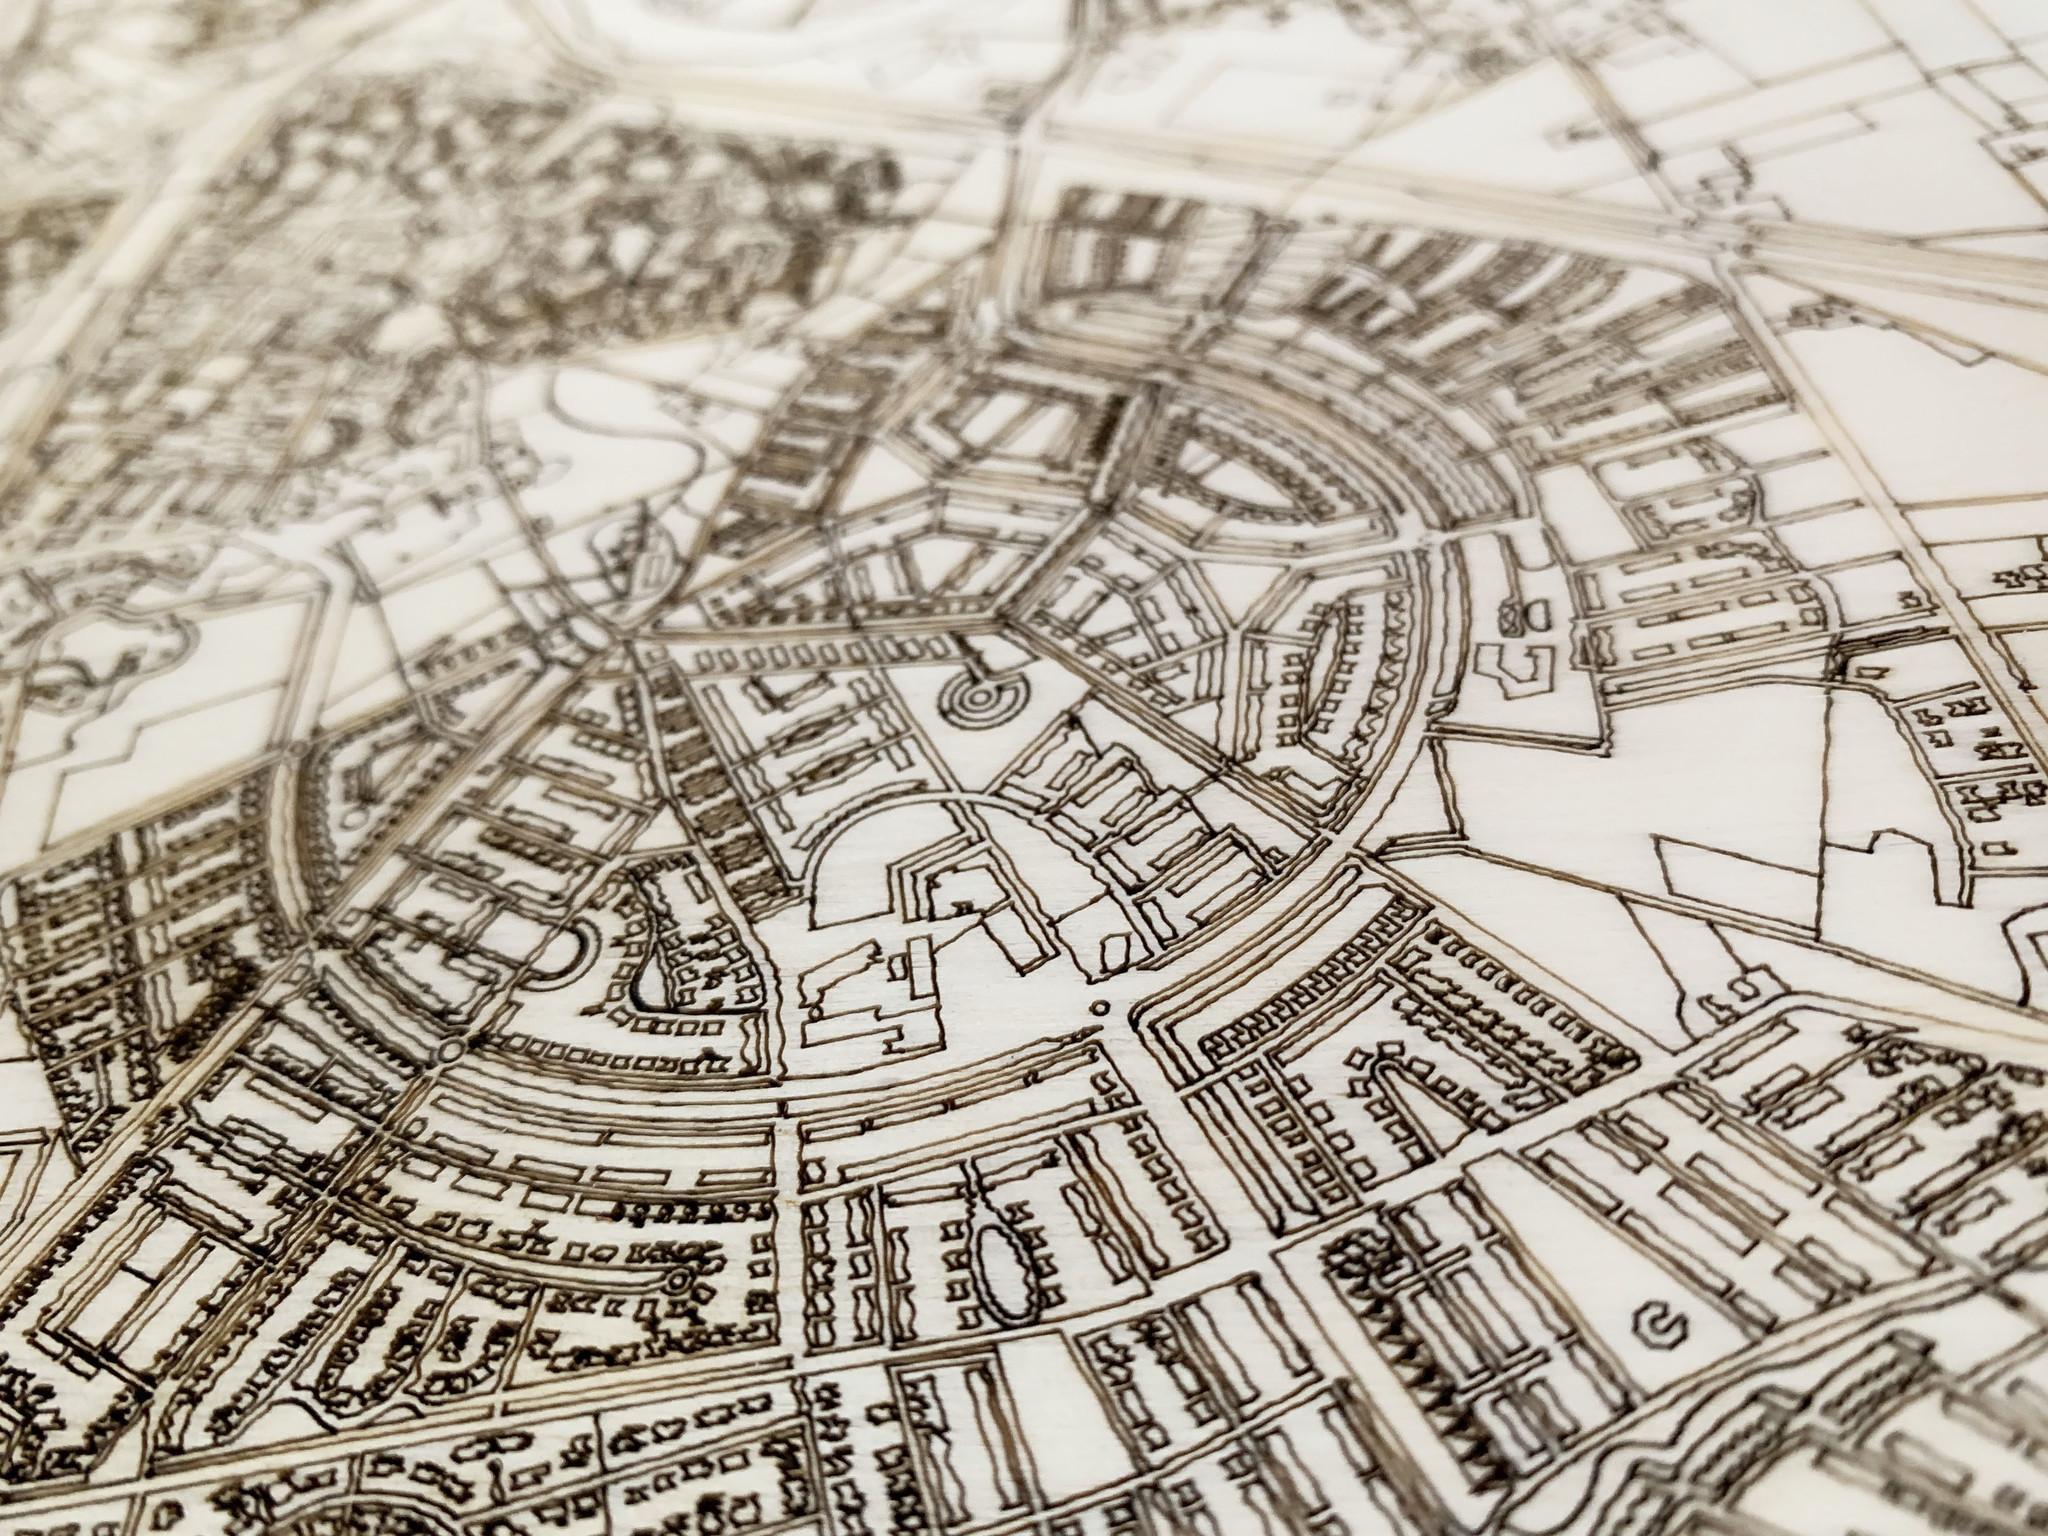 Houten stadsplattegrond Brussel-4